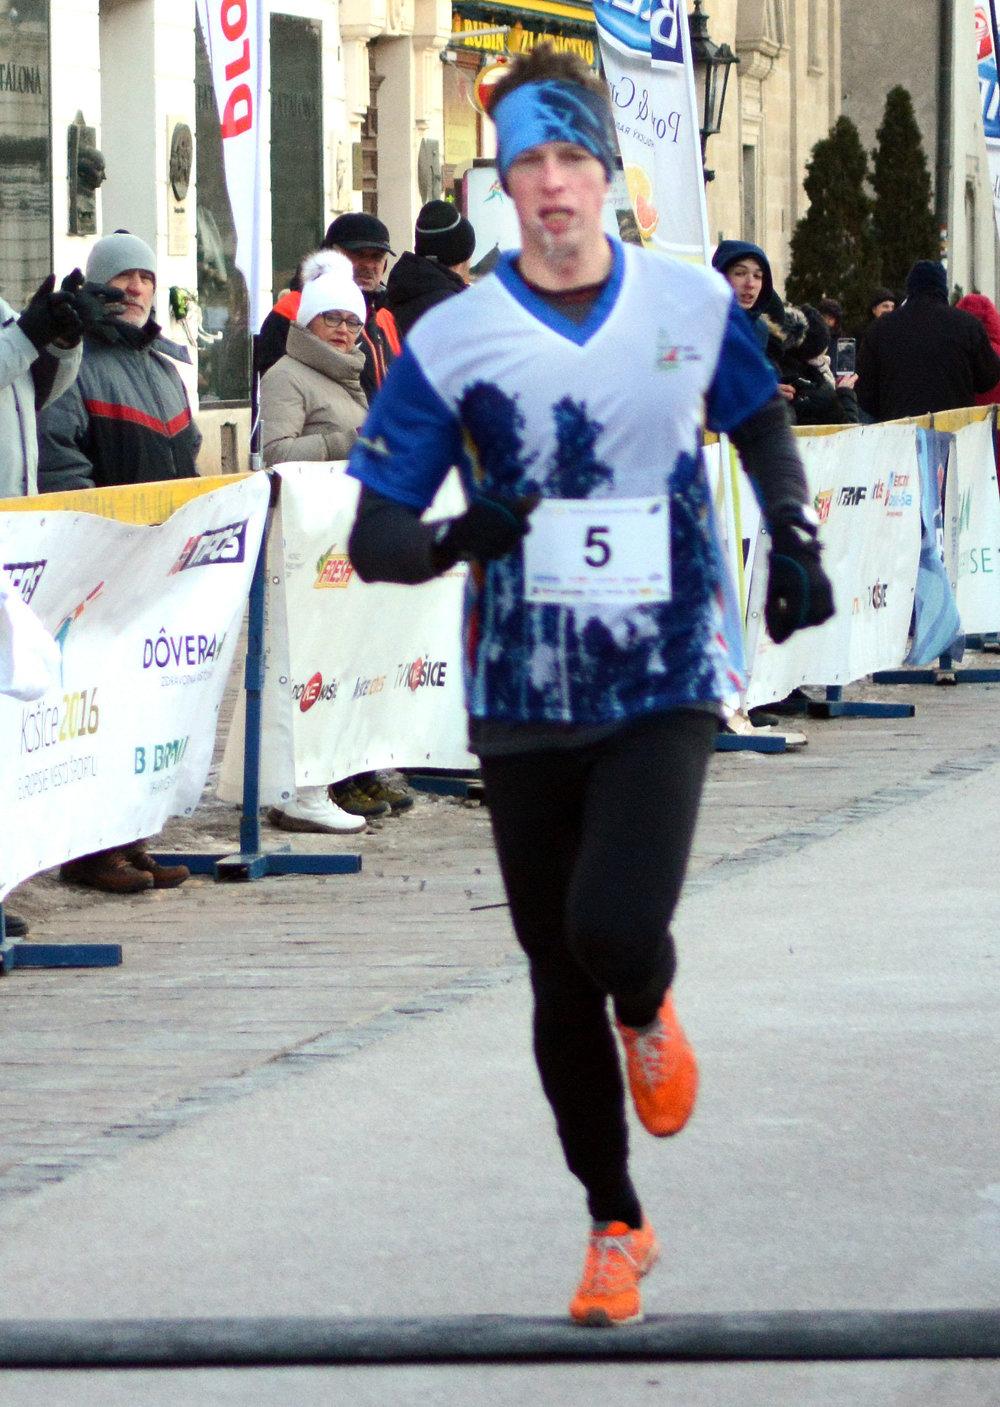 Tomáš Mušinský. Dobehol prvý s časom 16.58.